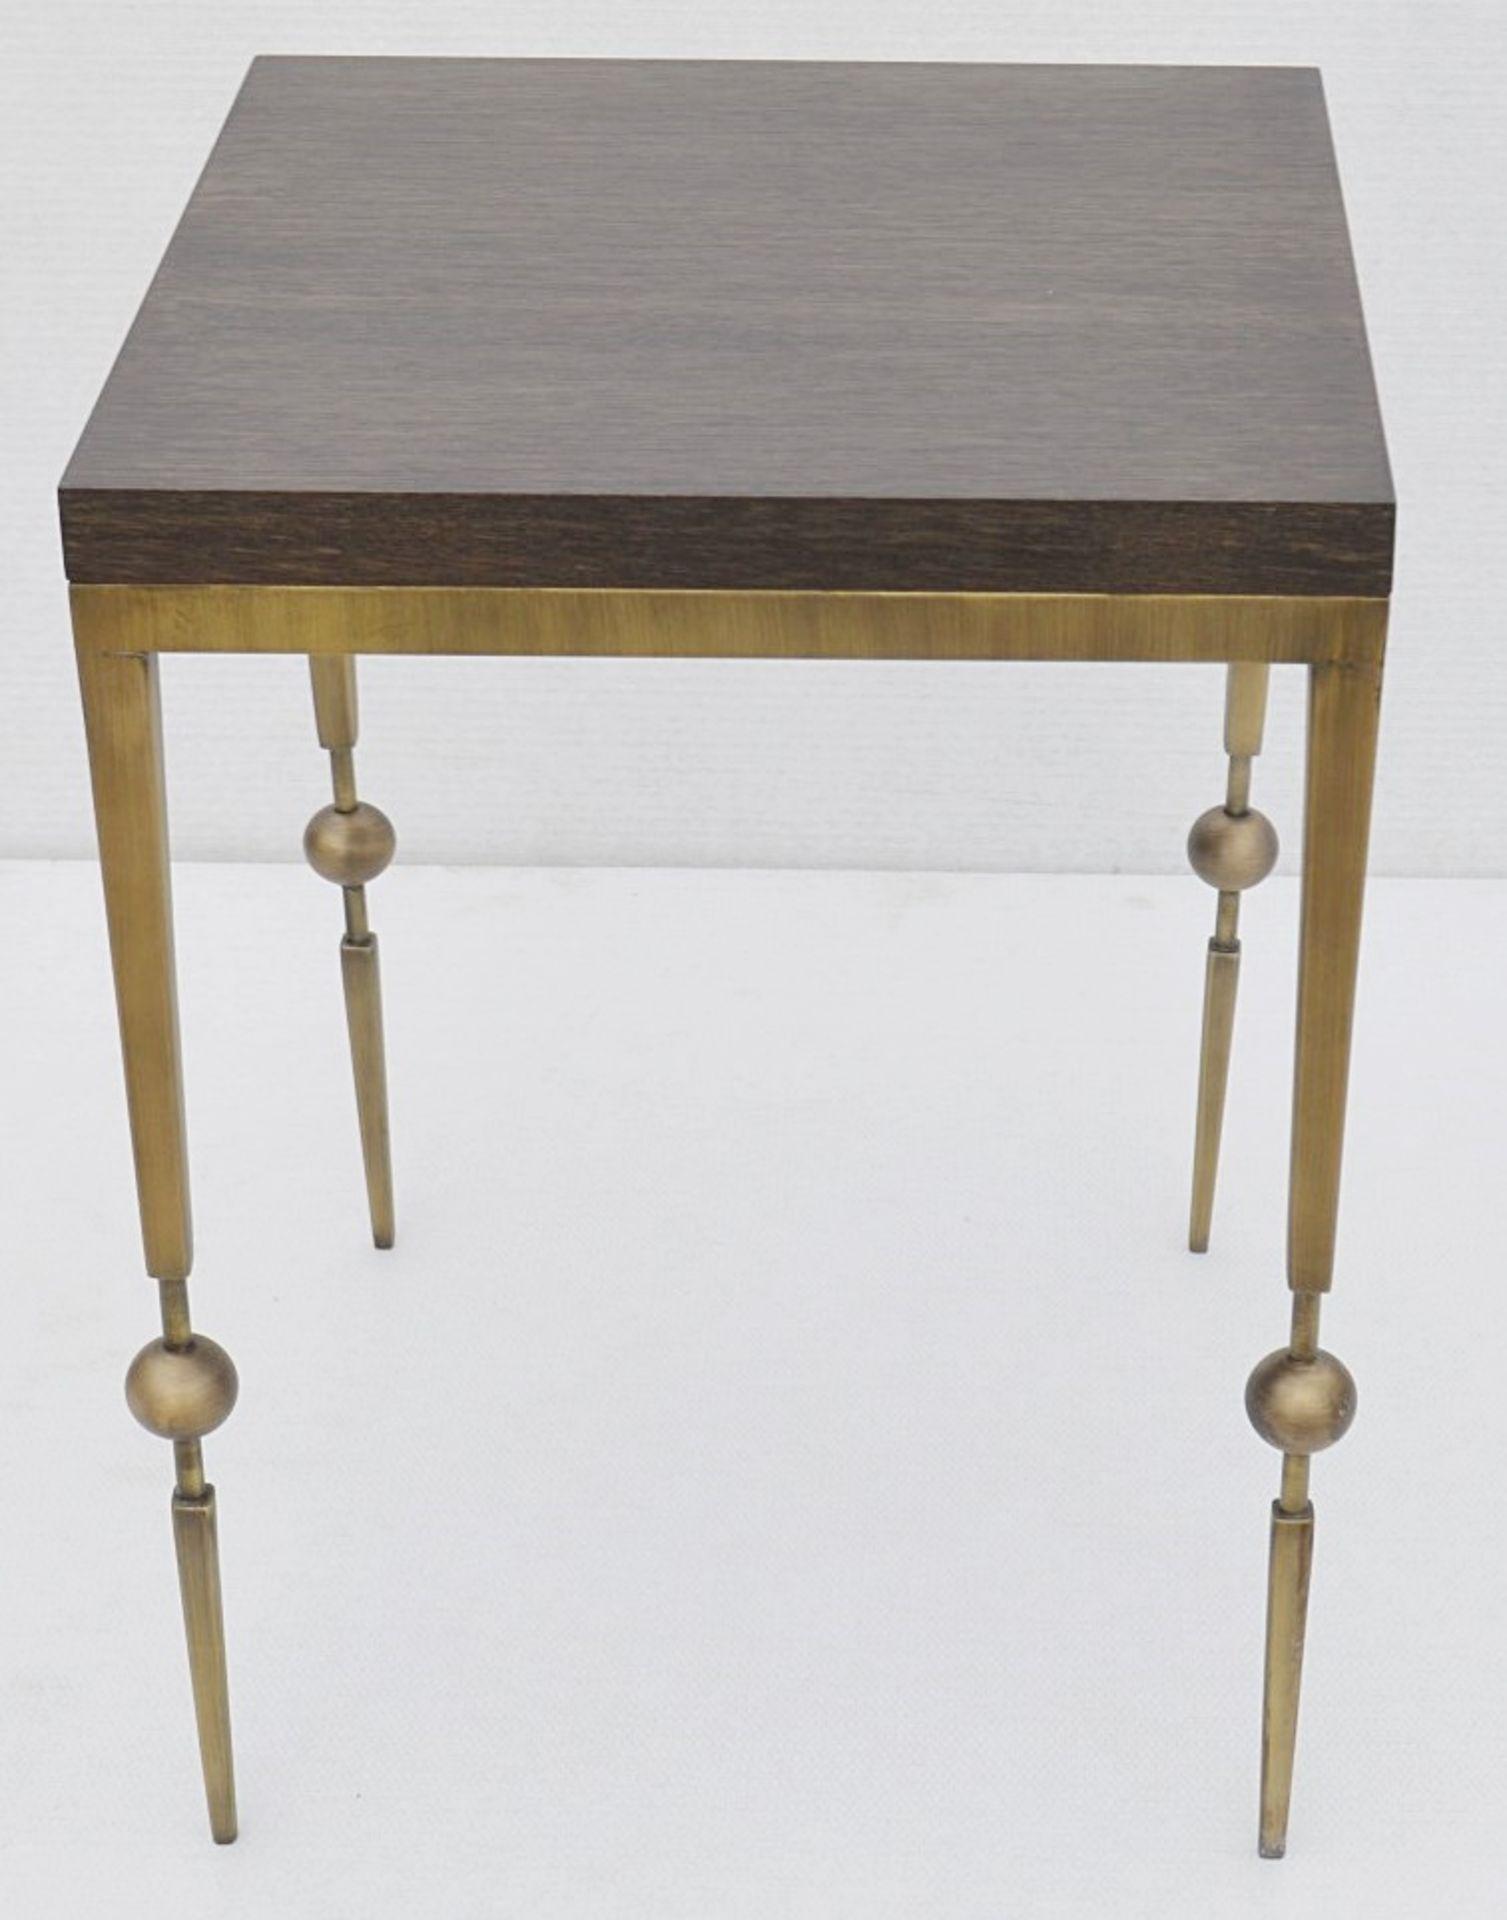 1 x JUSTIN VAN BREDA 'Sphere' Designer Occasional Table - Dimensions: H70 x W52 x D52cm - Ref: - Image 7 of 7